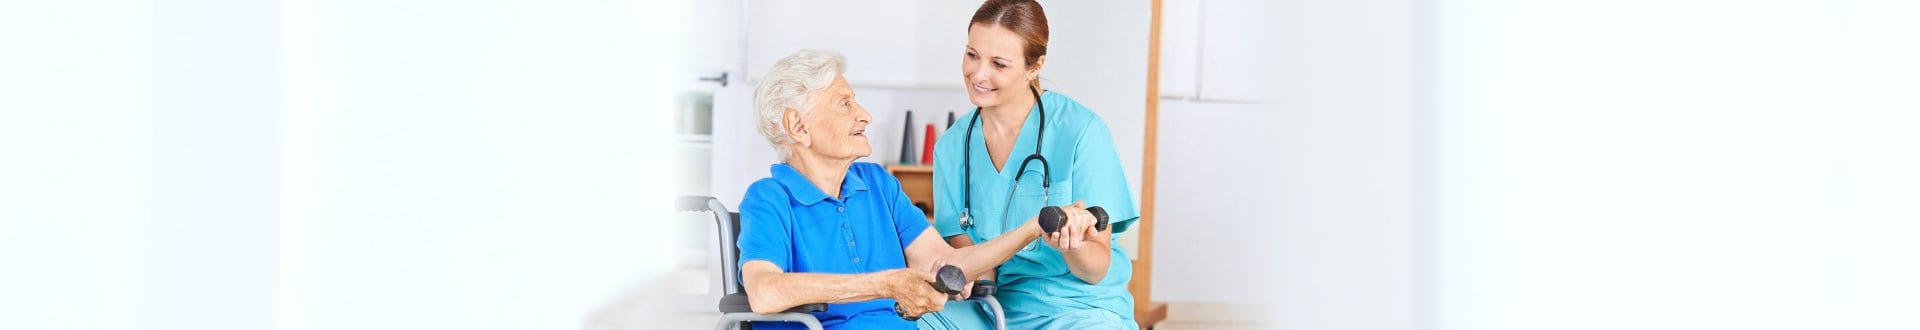 female medical staff assisting senior woman